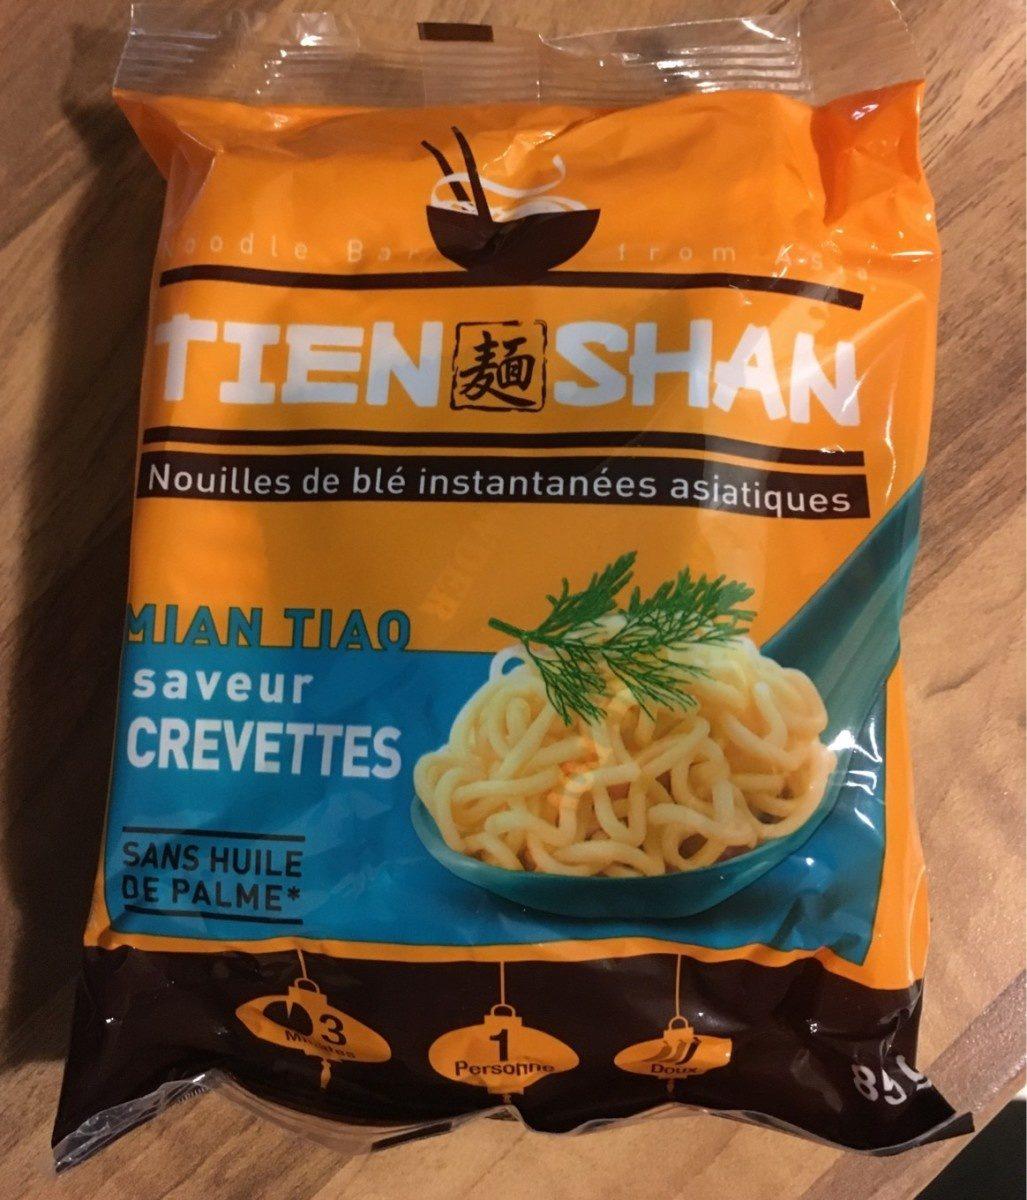 Tien shan - Produit - fr